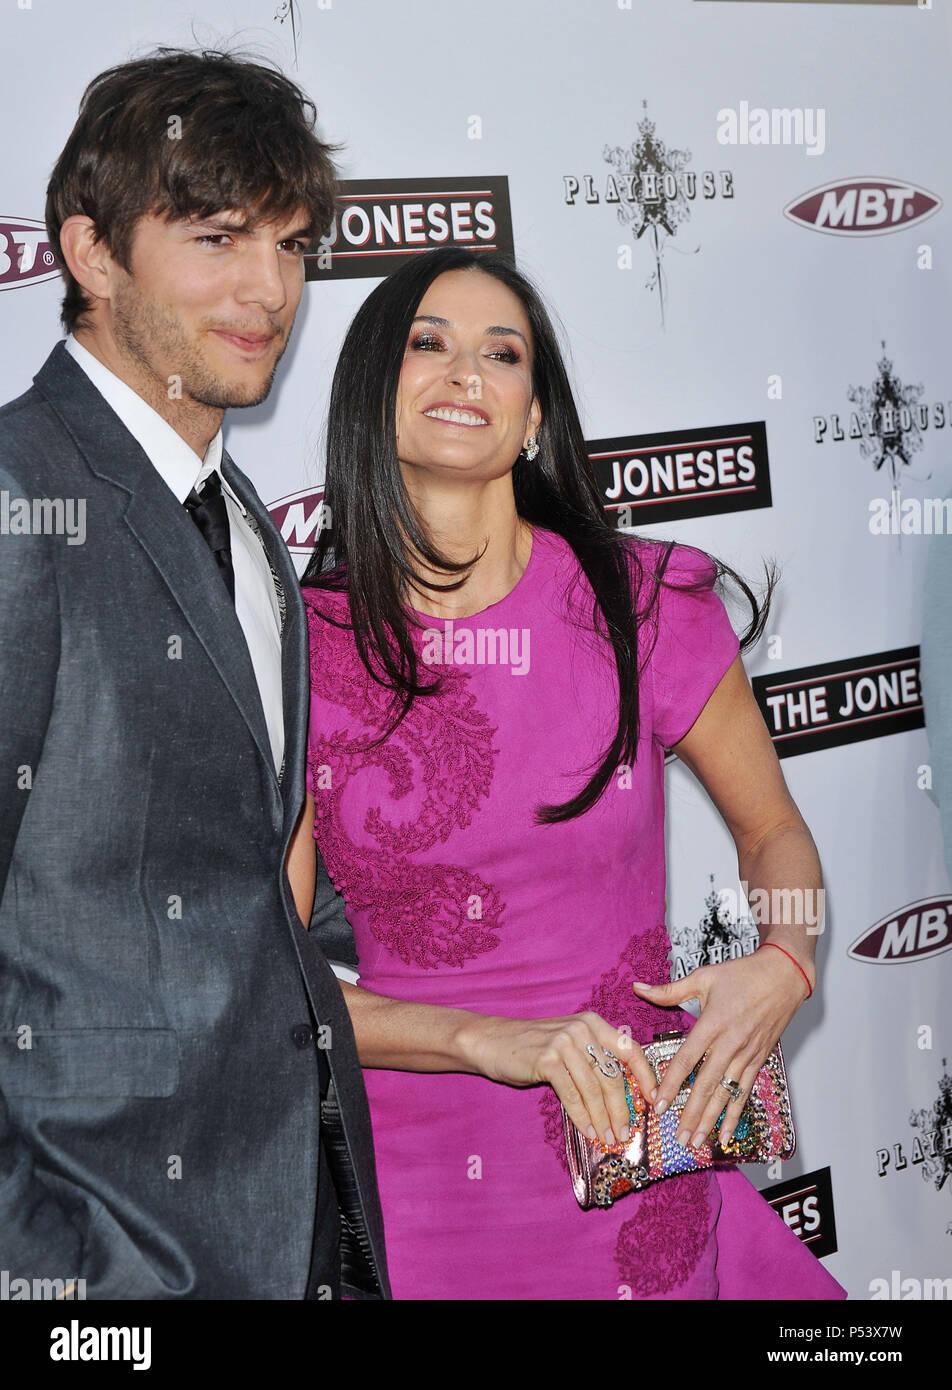 896278d5623e Ashton Kutcher   Demi Moore  32 - The Joneses Premiere at the Arclight  Theatre In Los